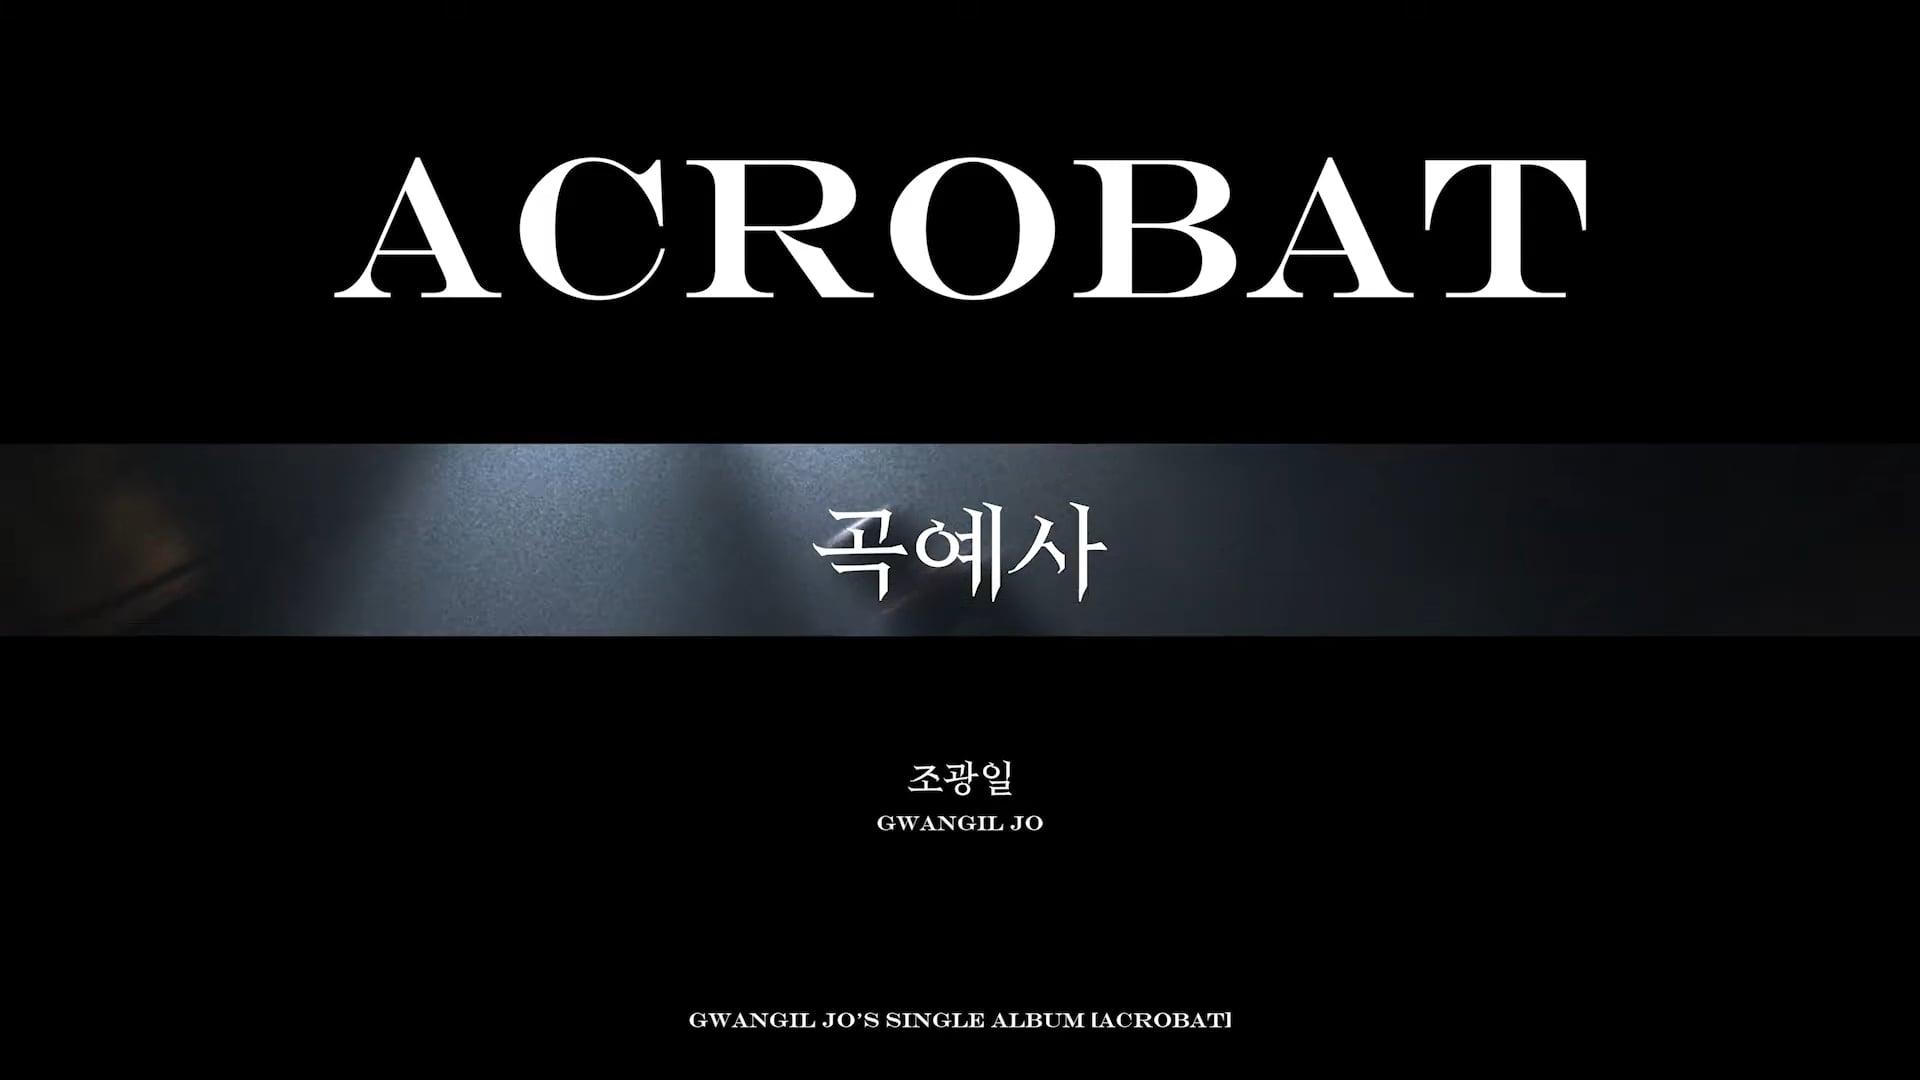 [Special Clip] Gwangil Jo(조광일) - Acrobat(곡예사) (Live ver.)